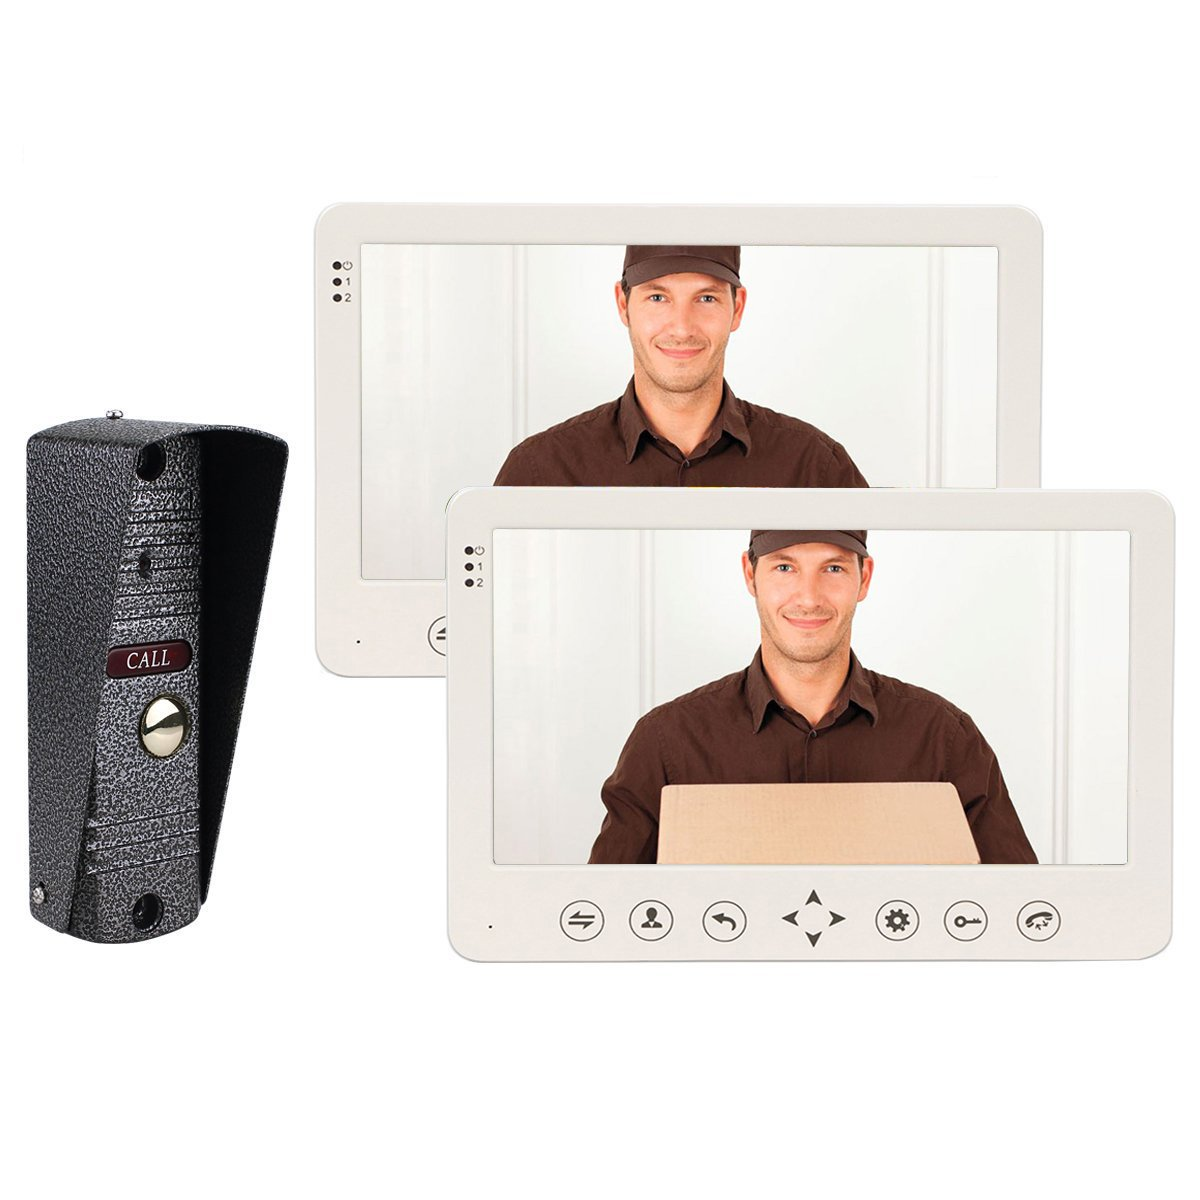 TIVDIO CP80 Video Door Phone Wired Video Intercom System Night Vision Doorbell Intercom with 1 IR Night Doorbell Camera and 2 Hands Free Monitor Intercom Doorbell (2 Monitor 1 Camera) by TIVDIO